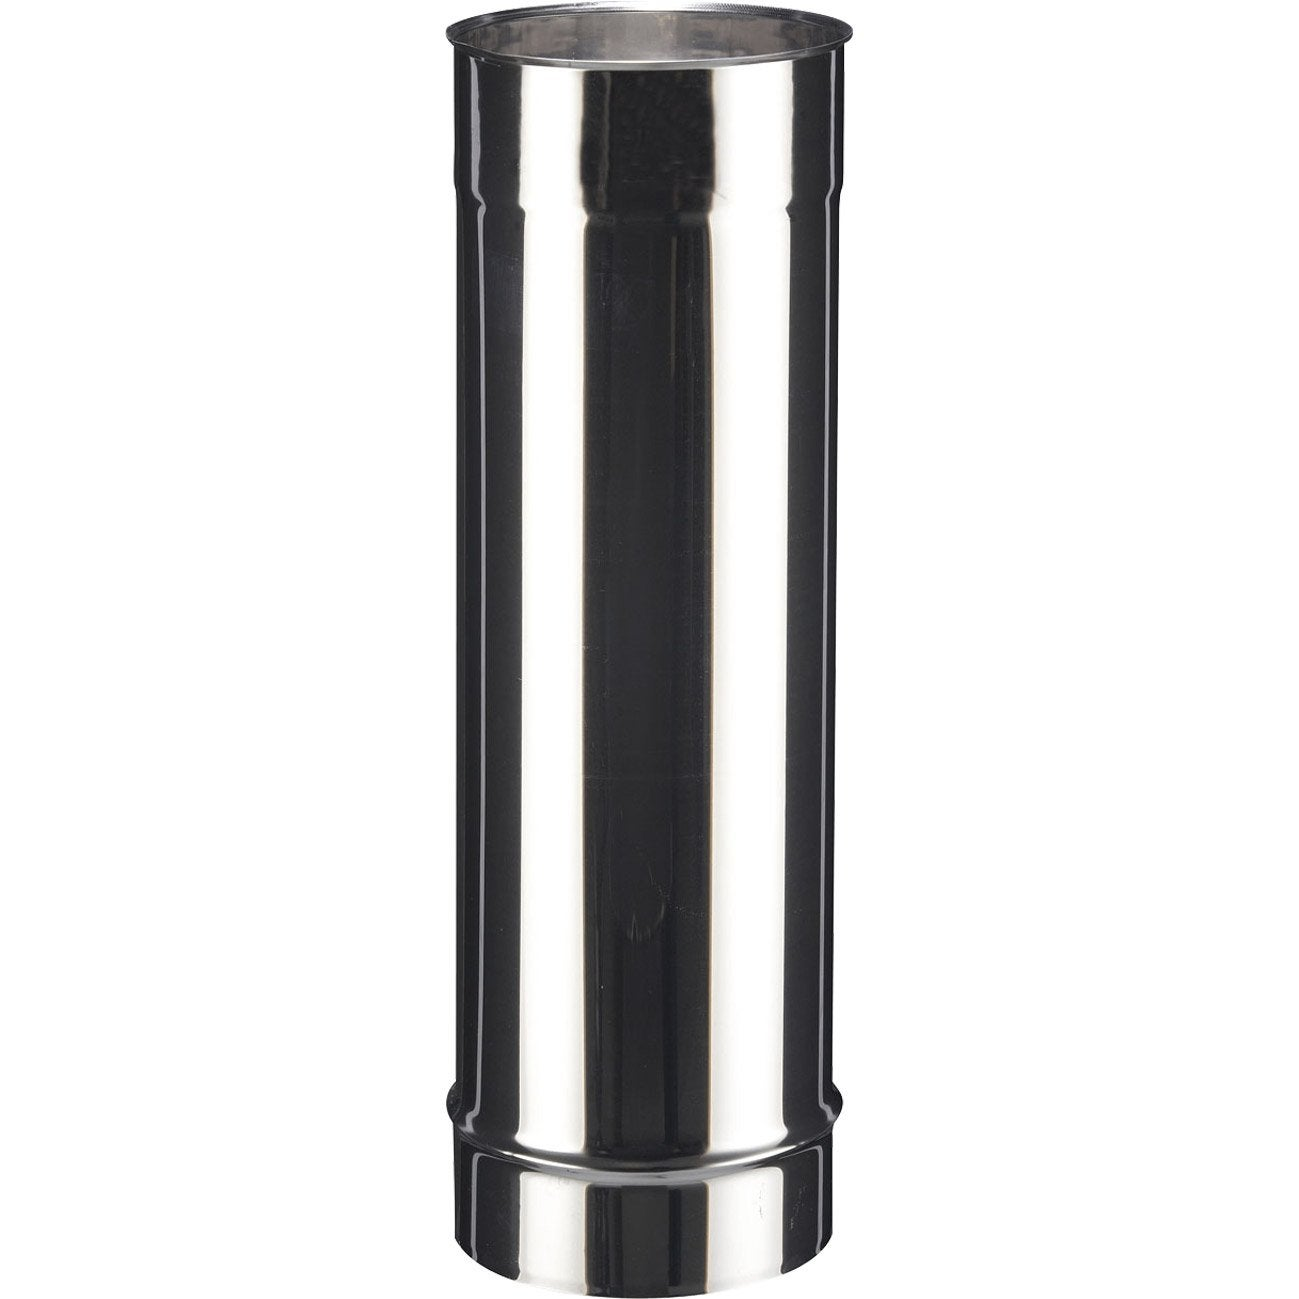 tuyau inox de raccordement poujoulat diam 180 mm 50 cm. Black Bedroom Furniture Sets. Home Design Ideas